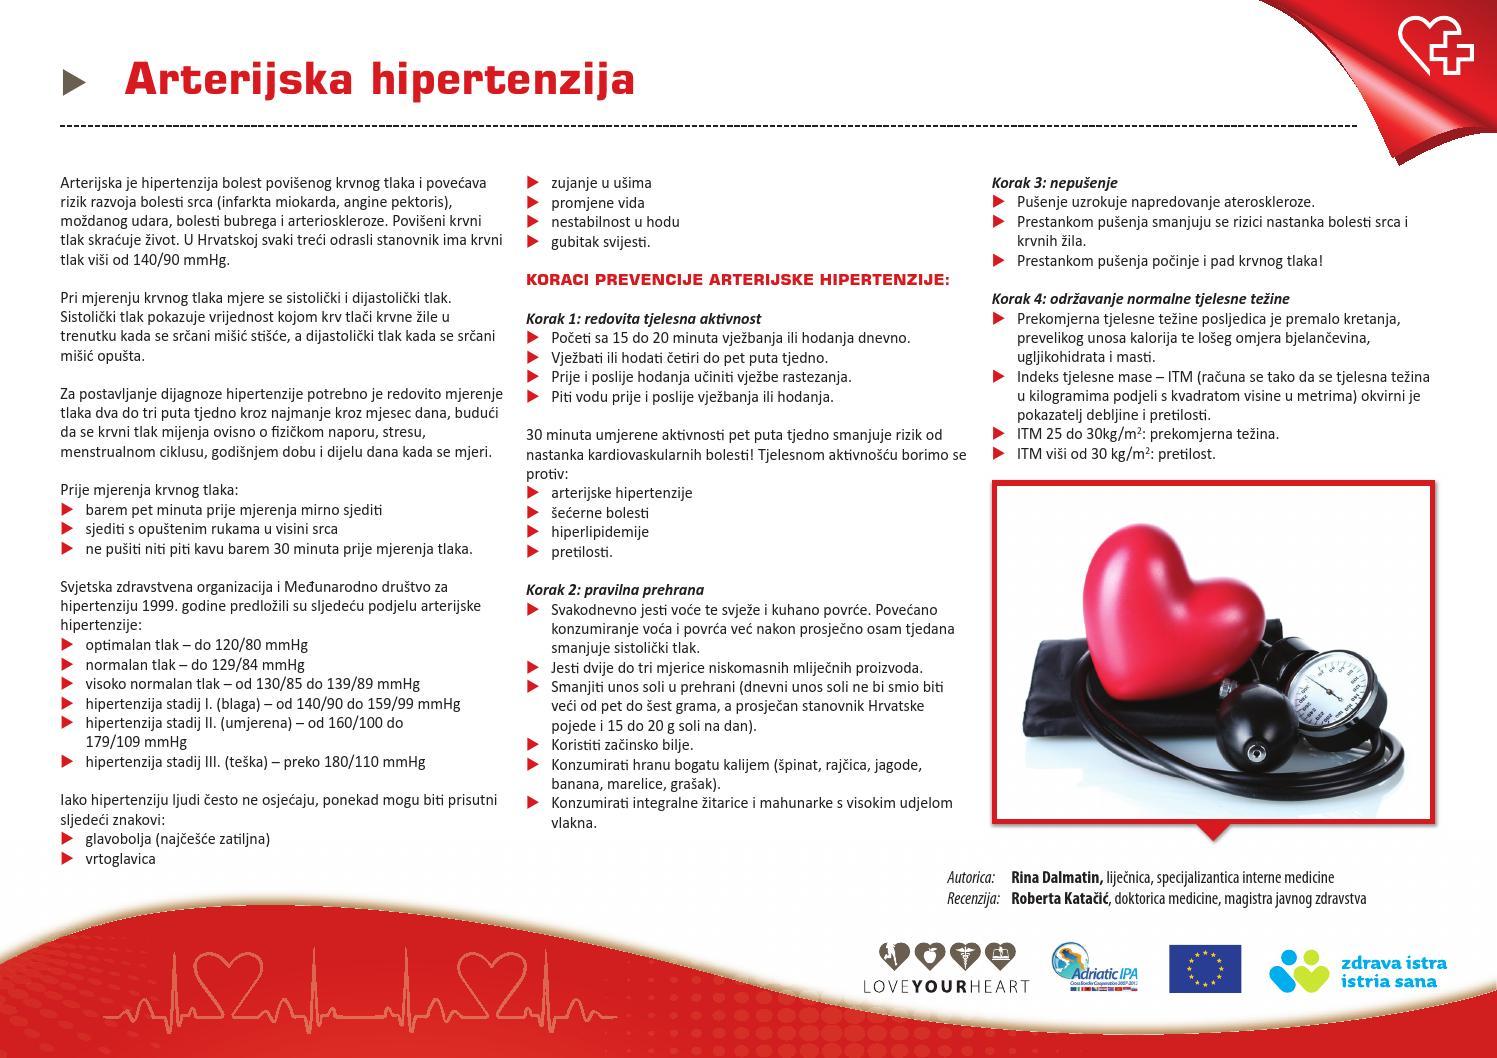 hipertenzija i infarkt miokarda